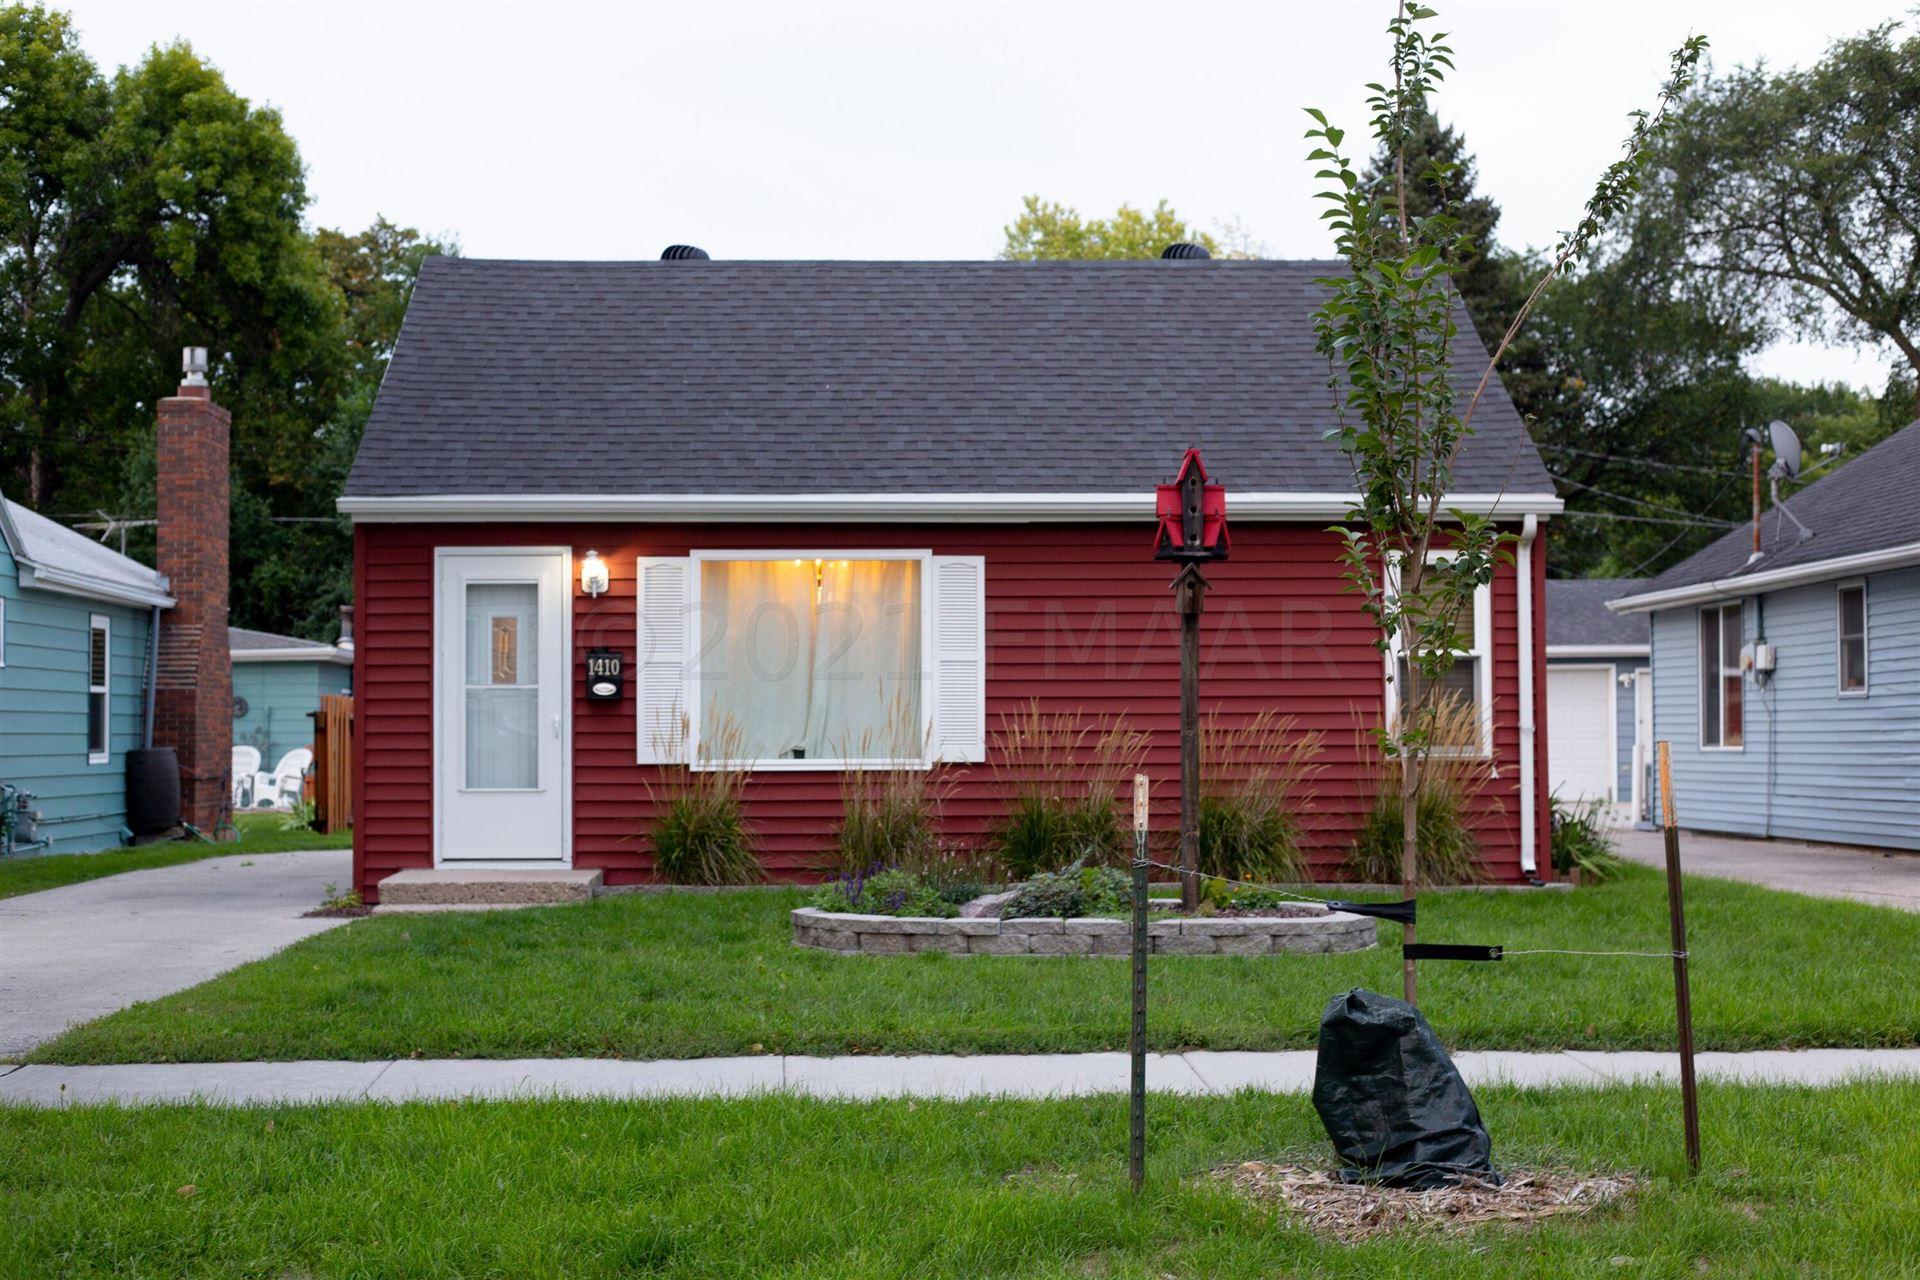 1410 14 1\/2 Street S, Fargo, ND 58102 - #: 21-4923